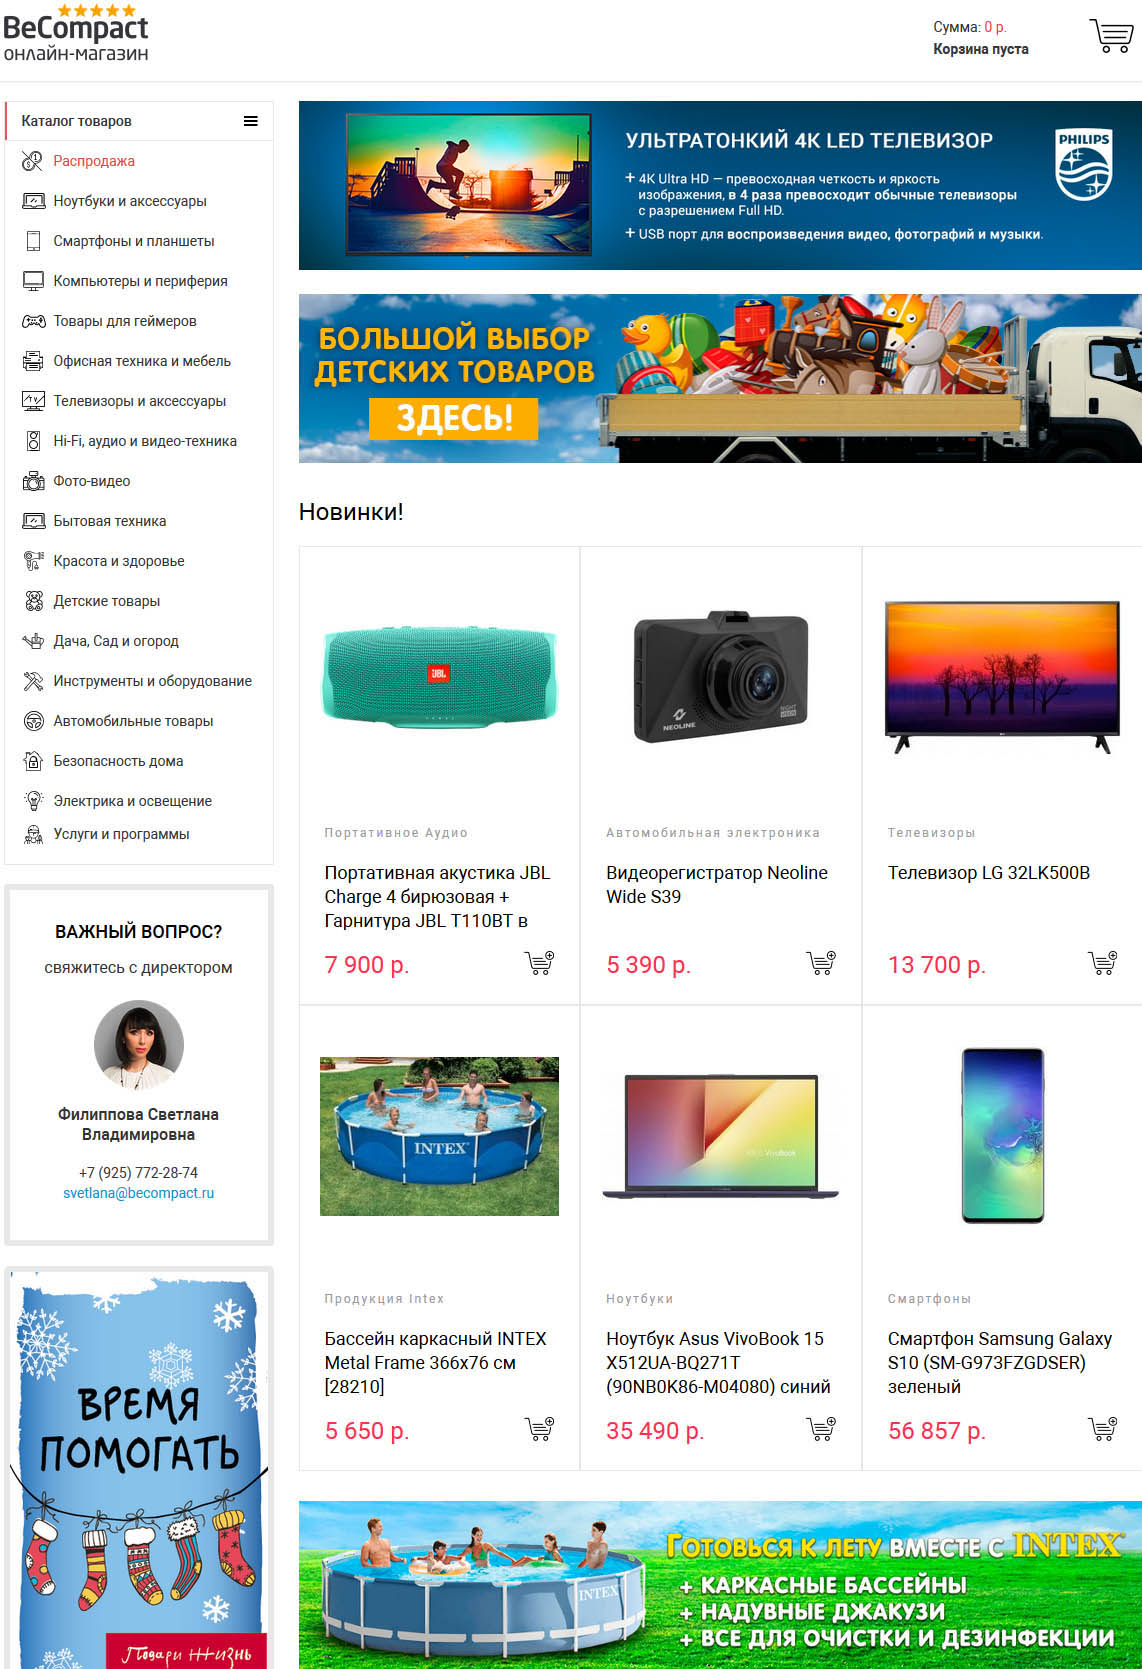 Интернет-магазин BeCompact